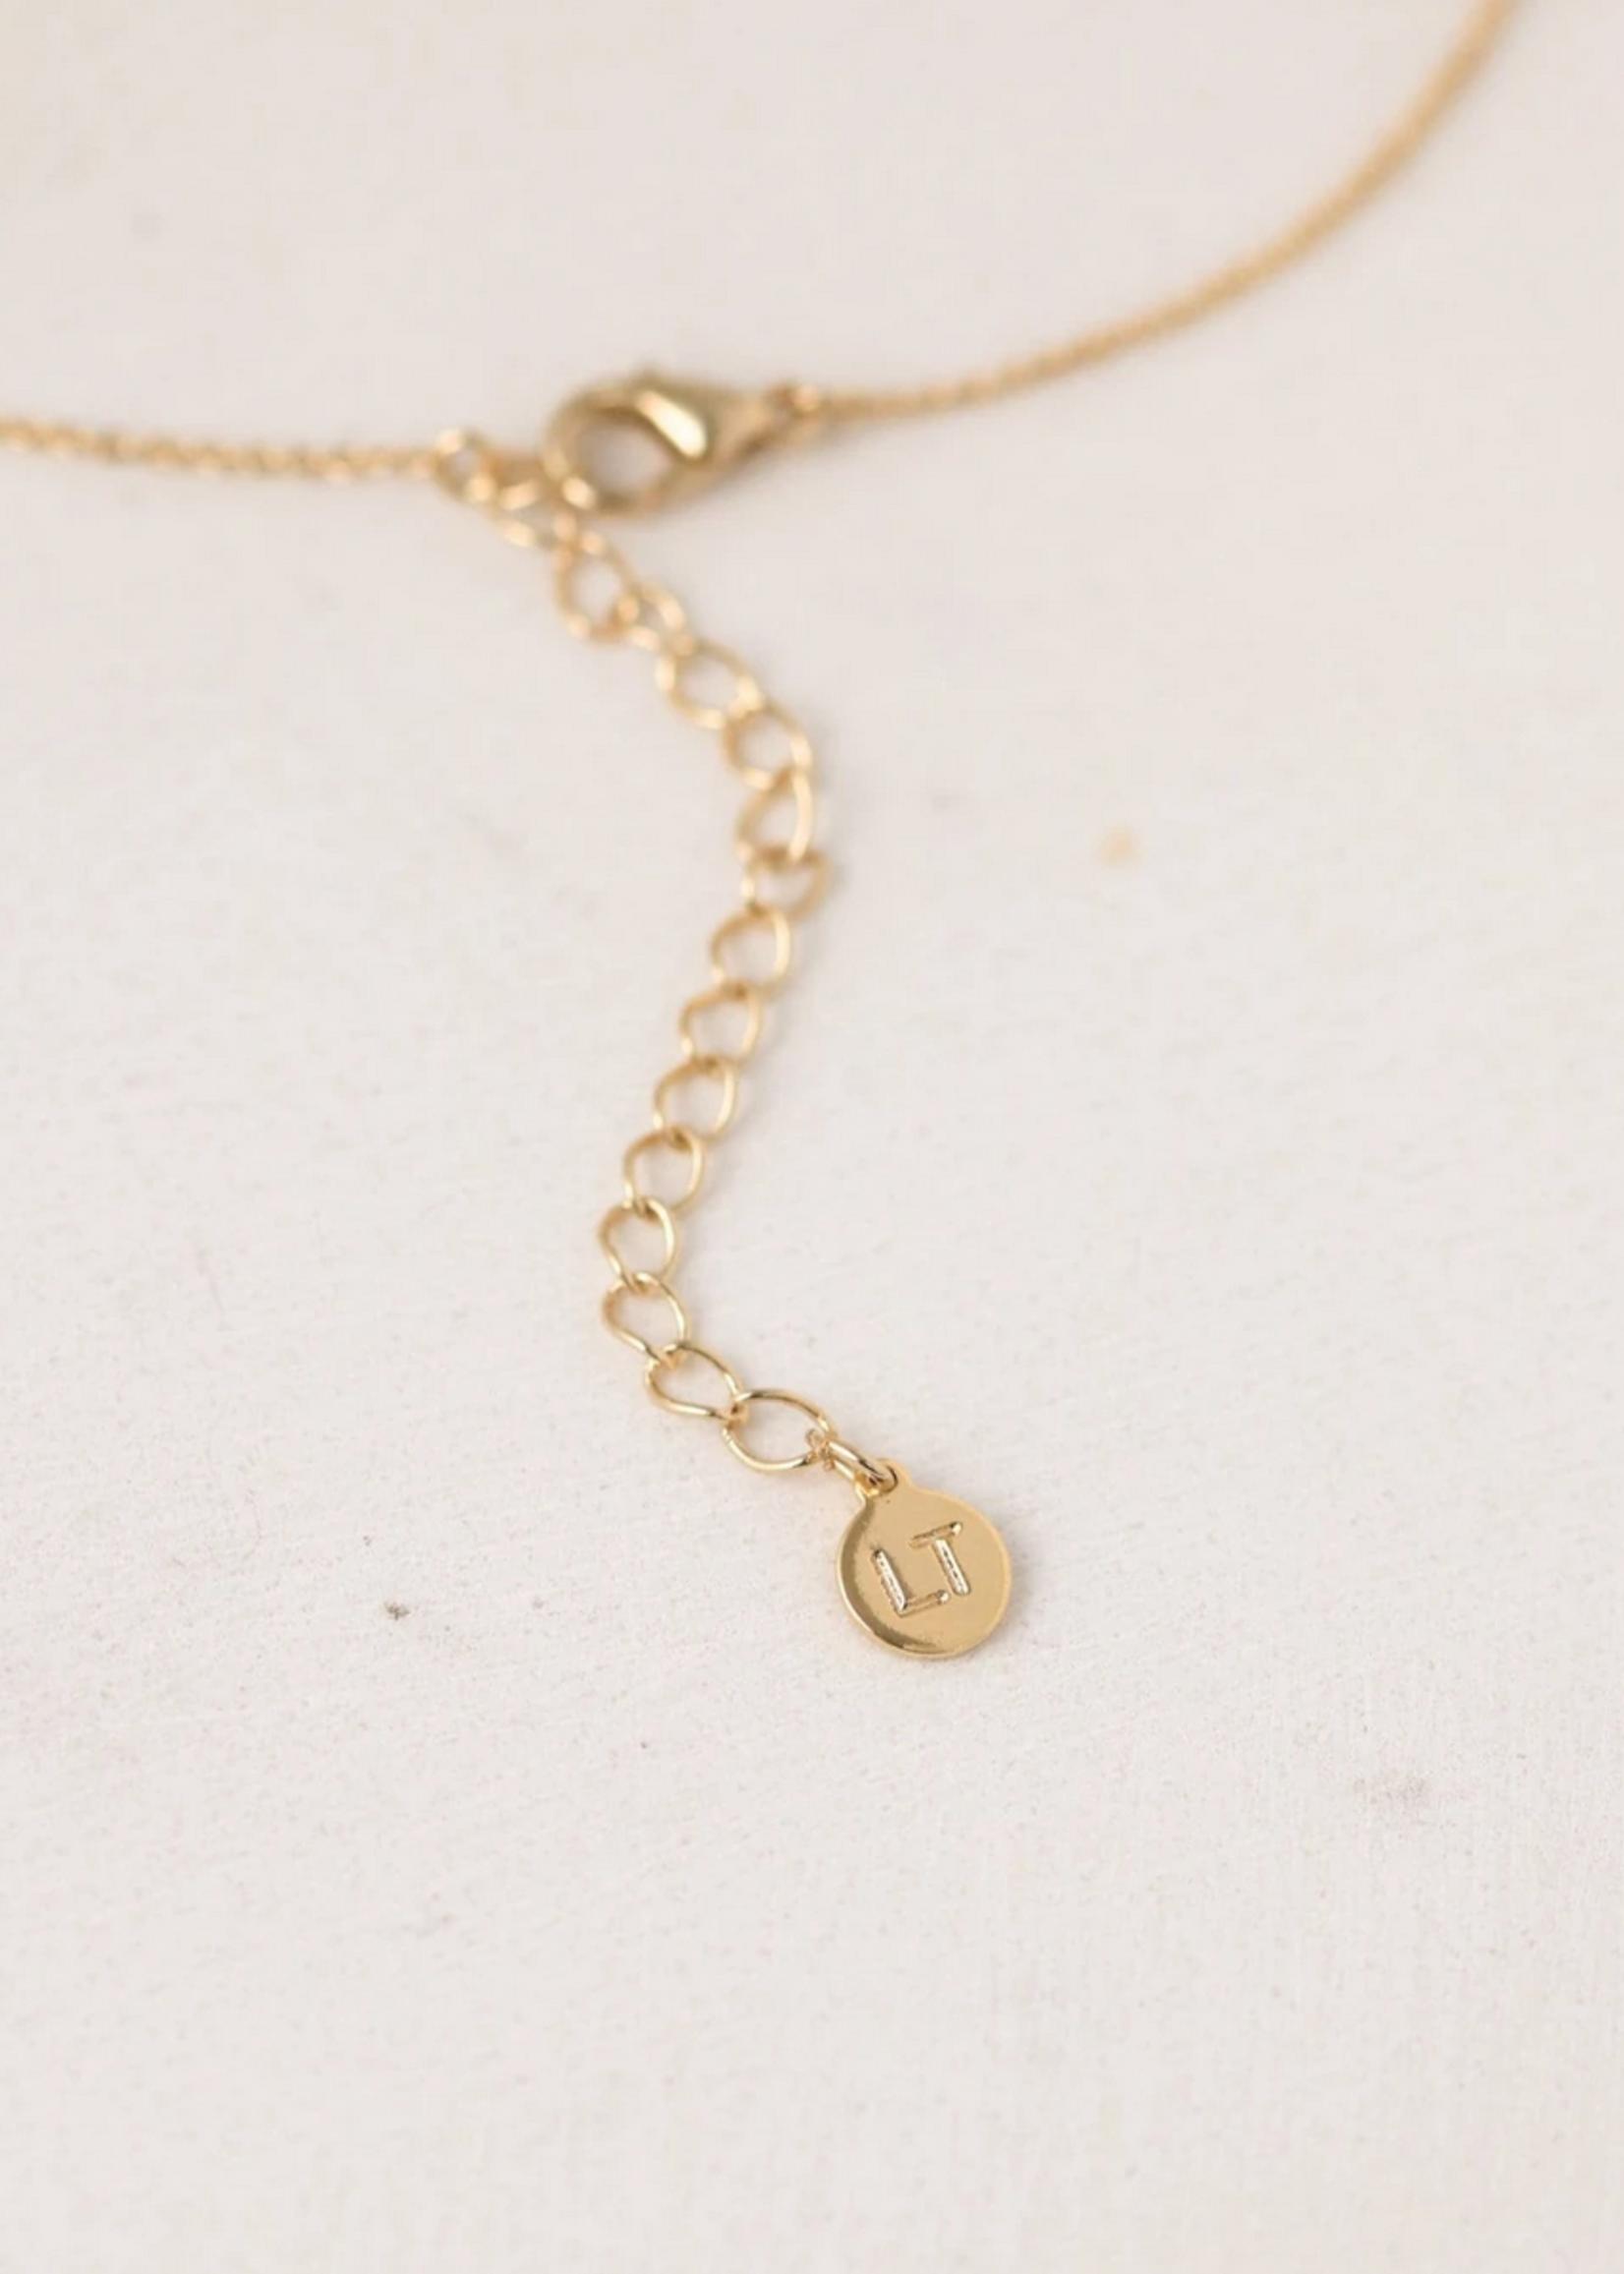 November Kaleidoscope Birthstone Necklace -gold